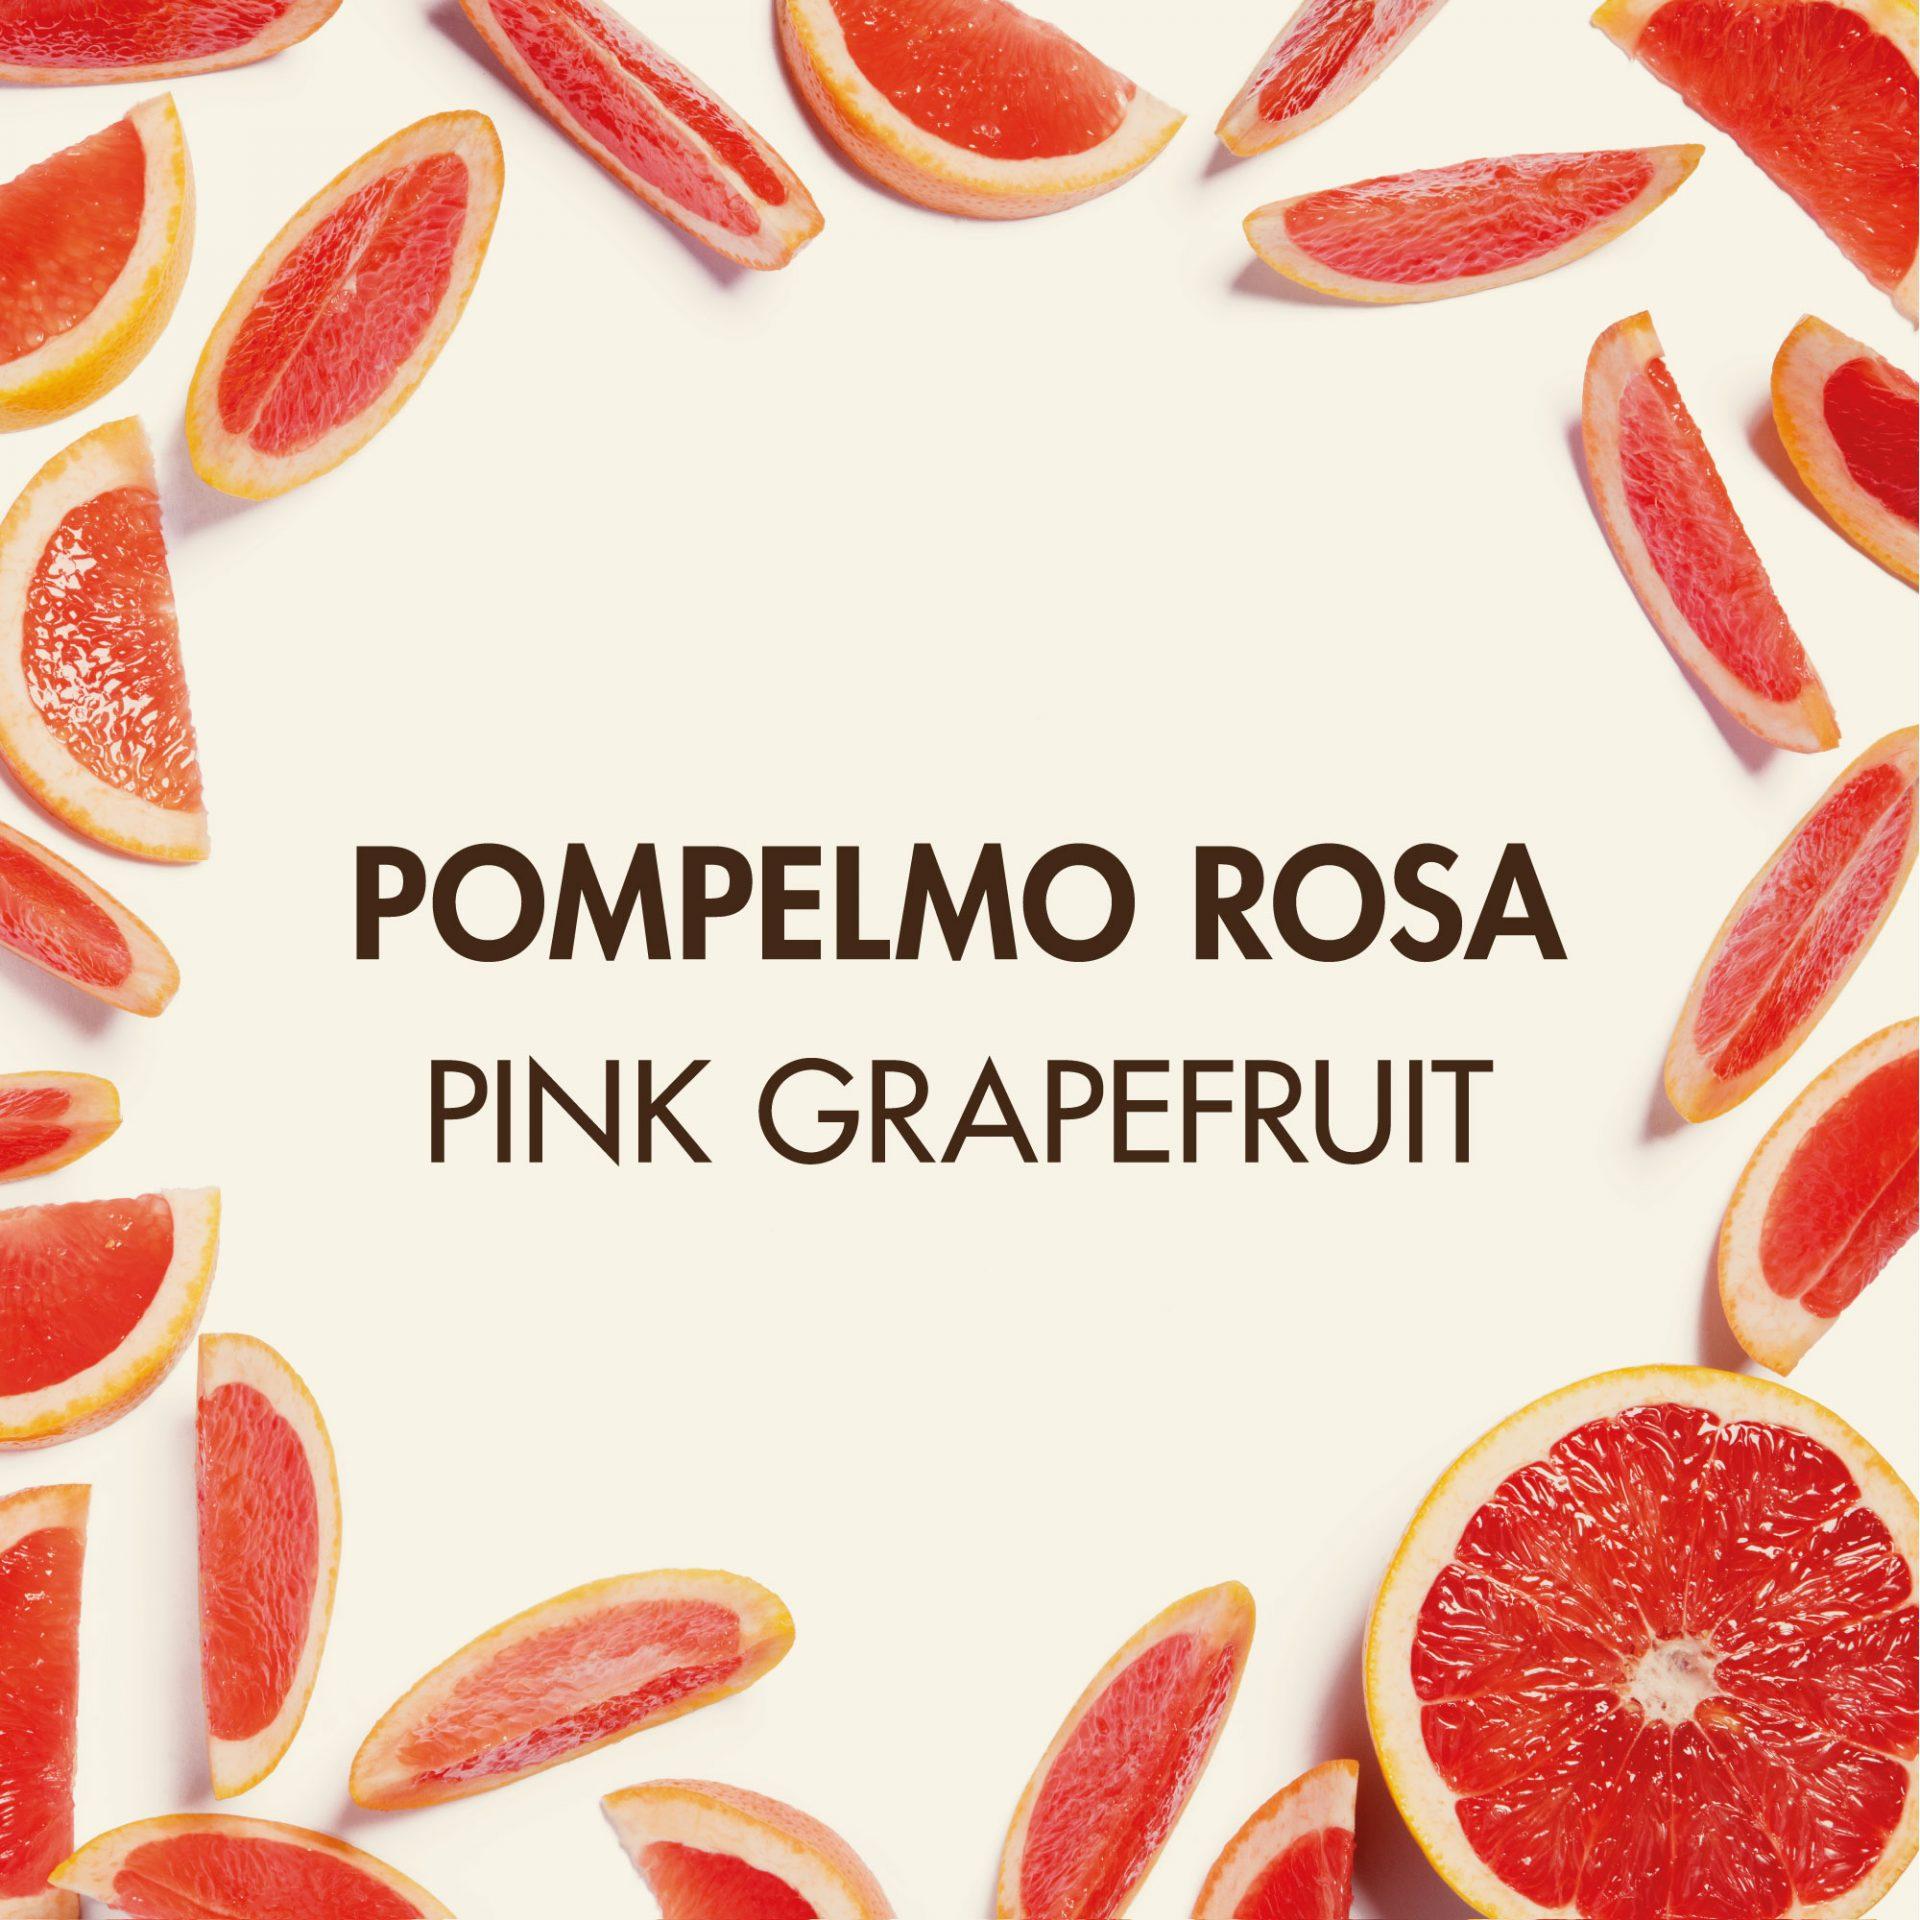 180419_Esecutivi_gusti_scala-1-1_Pompelmo-rosa_ITAENG